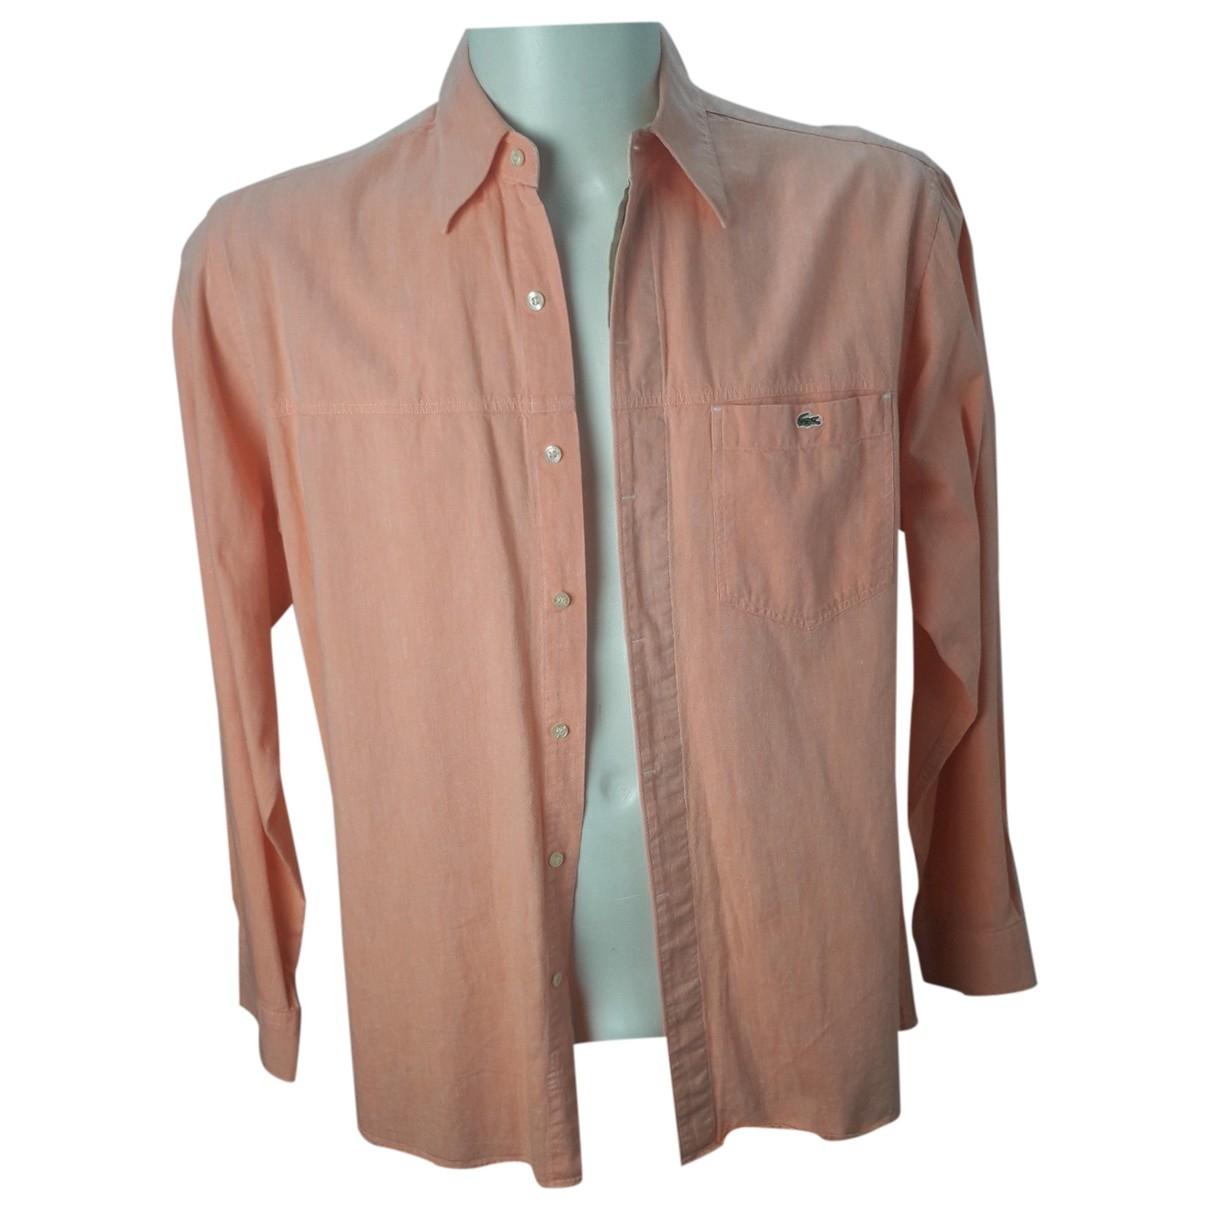 Lacoste \N Orange Cotton Shirts for Men 41 EU (tour de cou / collar)